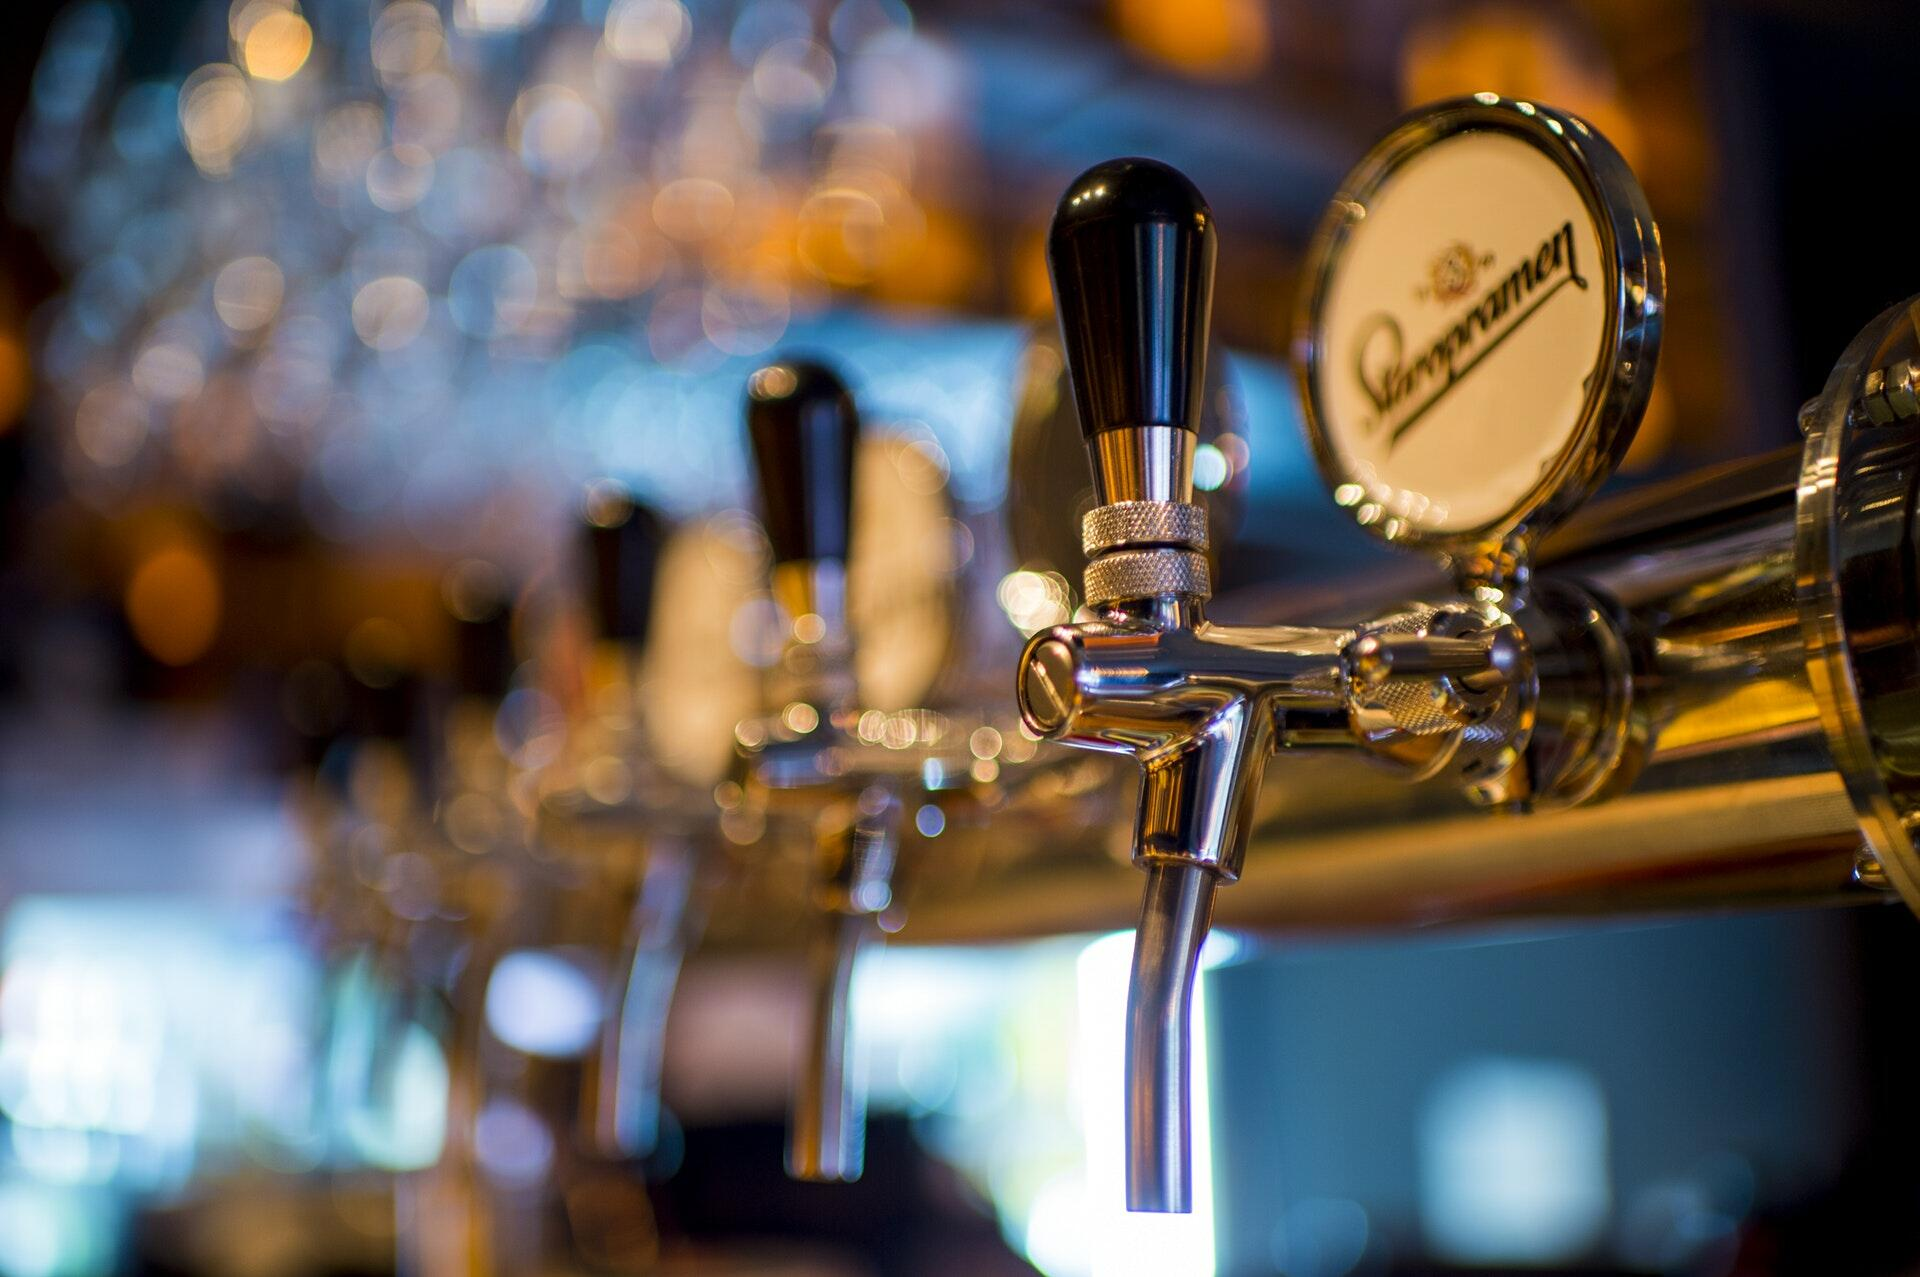 Beer Taps at Lodge Bar & Cafe - Yarra Valley Lodge